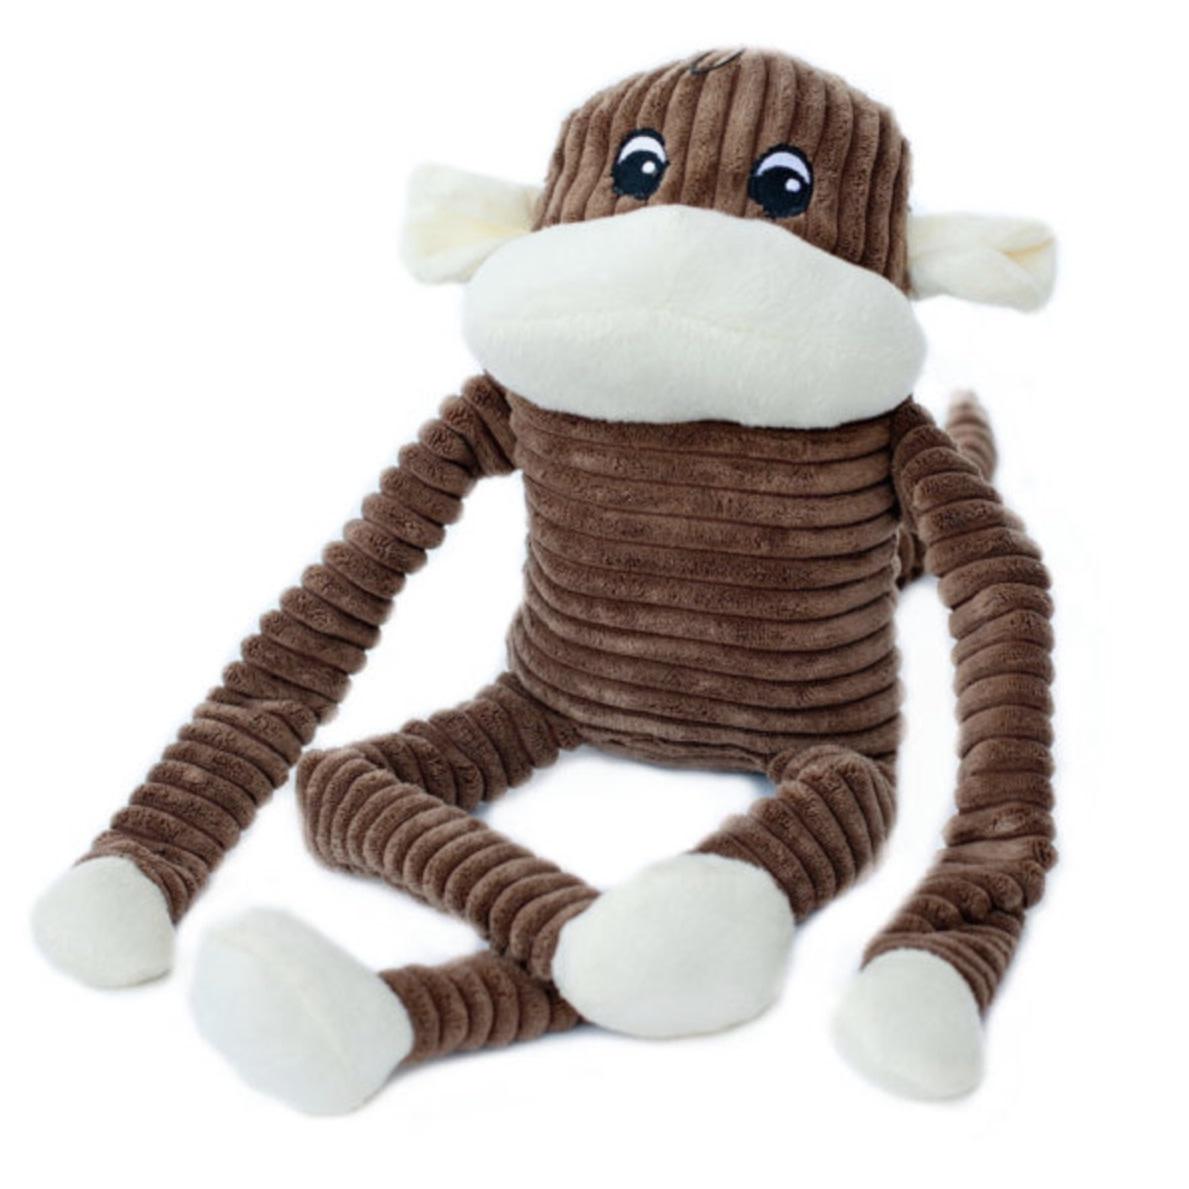 Zippypawz Spencer the Crinkle Monkey XL